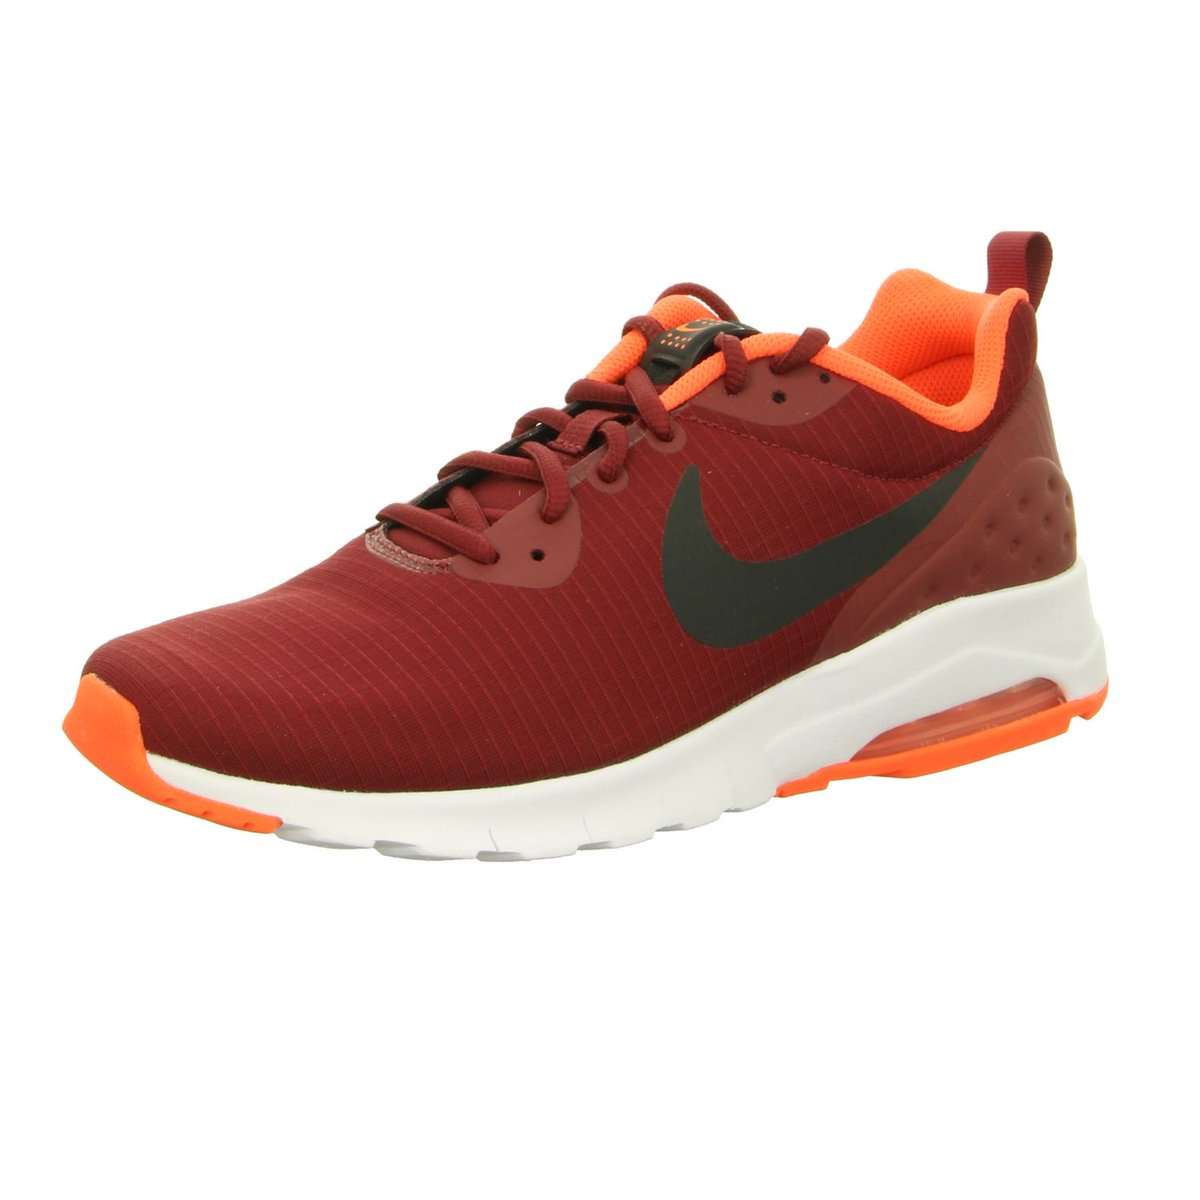 Hashtag Nike Twitter Schuhe Rot On fy7Y6bg